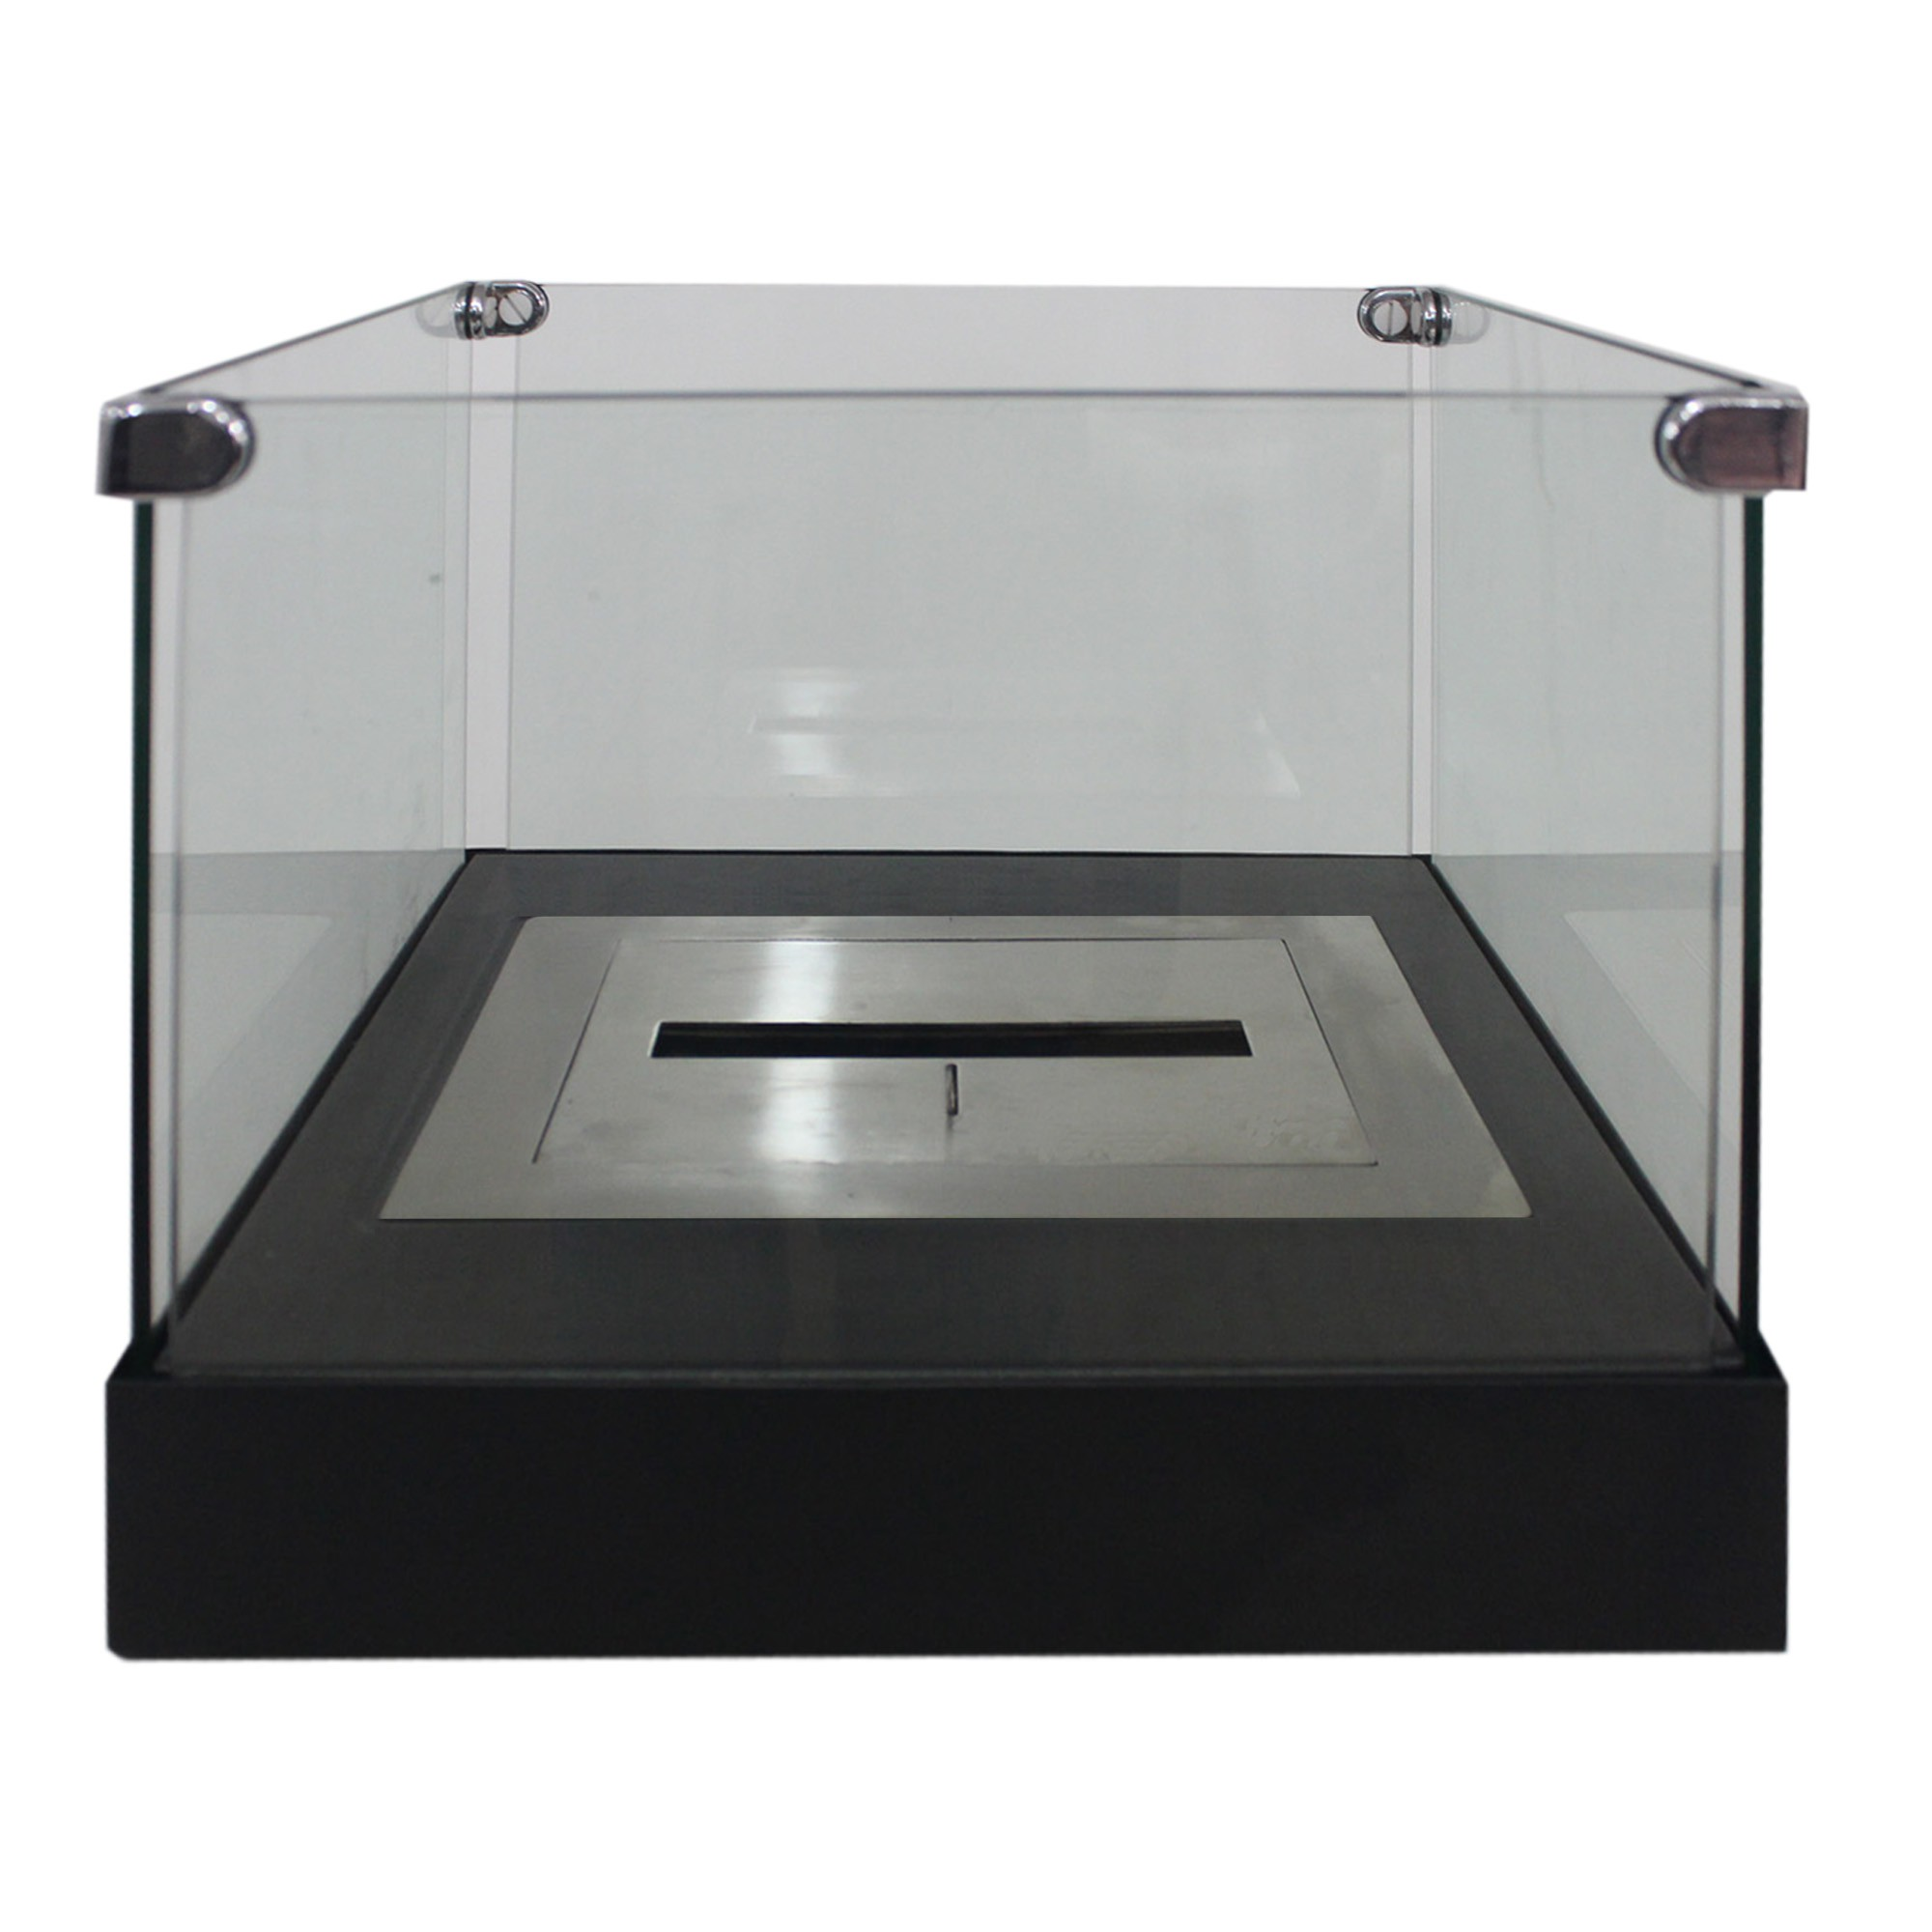 bio ethanol gel kamin ofen garten terrasse feuerstelle feuers ule feuerkorb deko. Black Bedroom Furniture Sets. Home Design Ideas